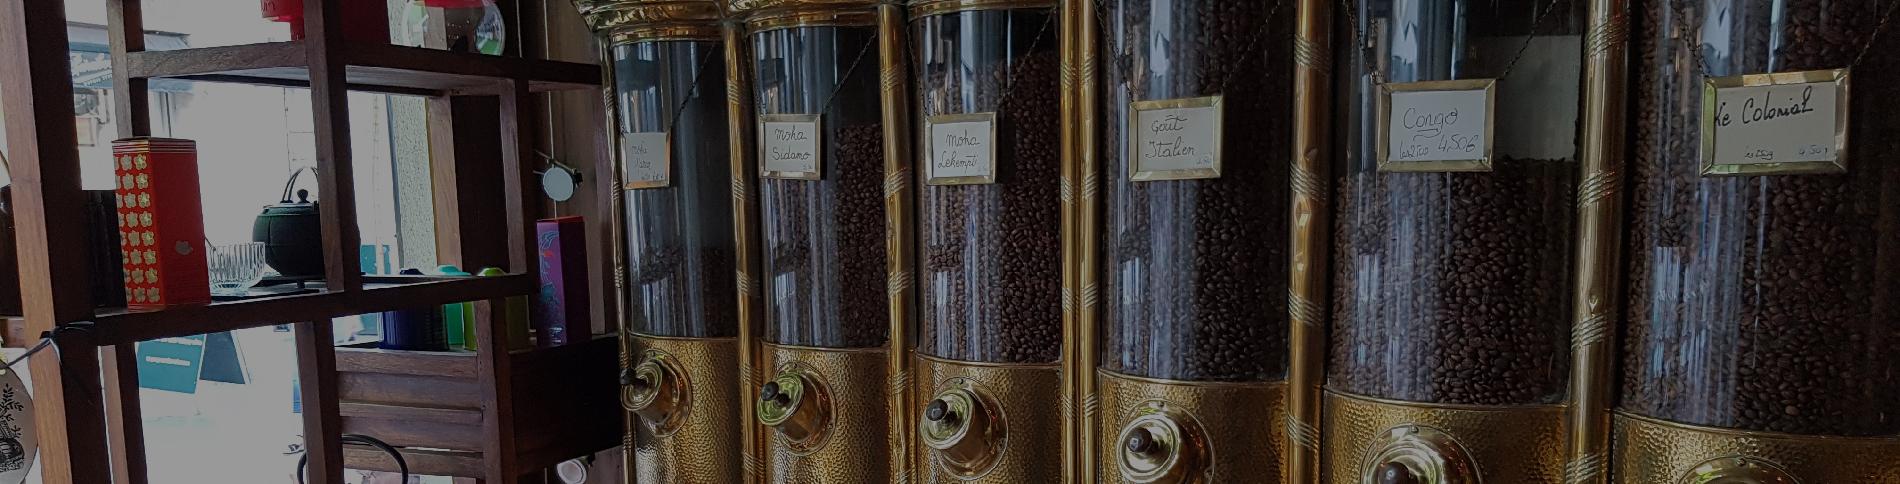 banniere cafe torrefaction bourgogne